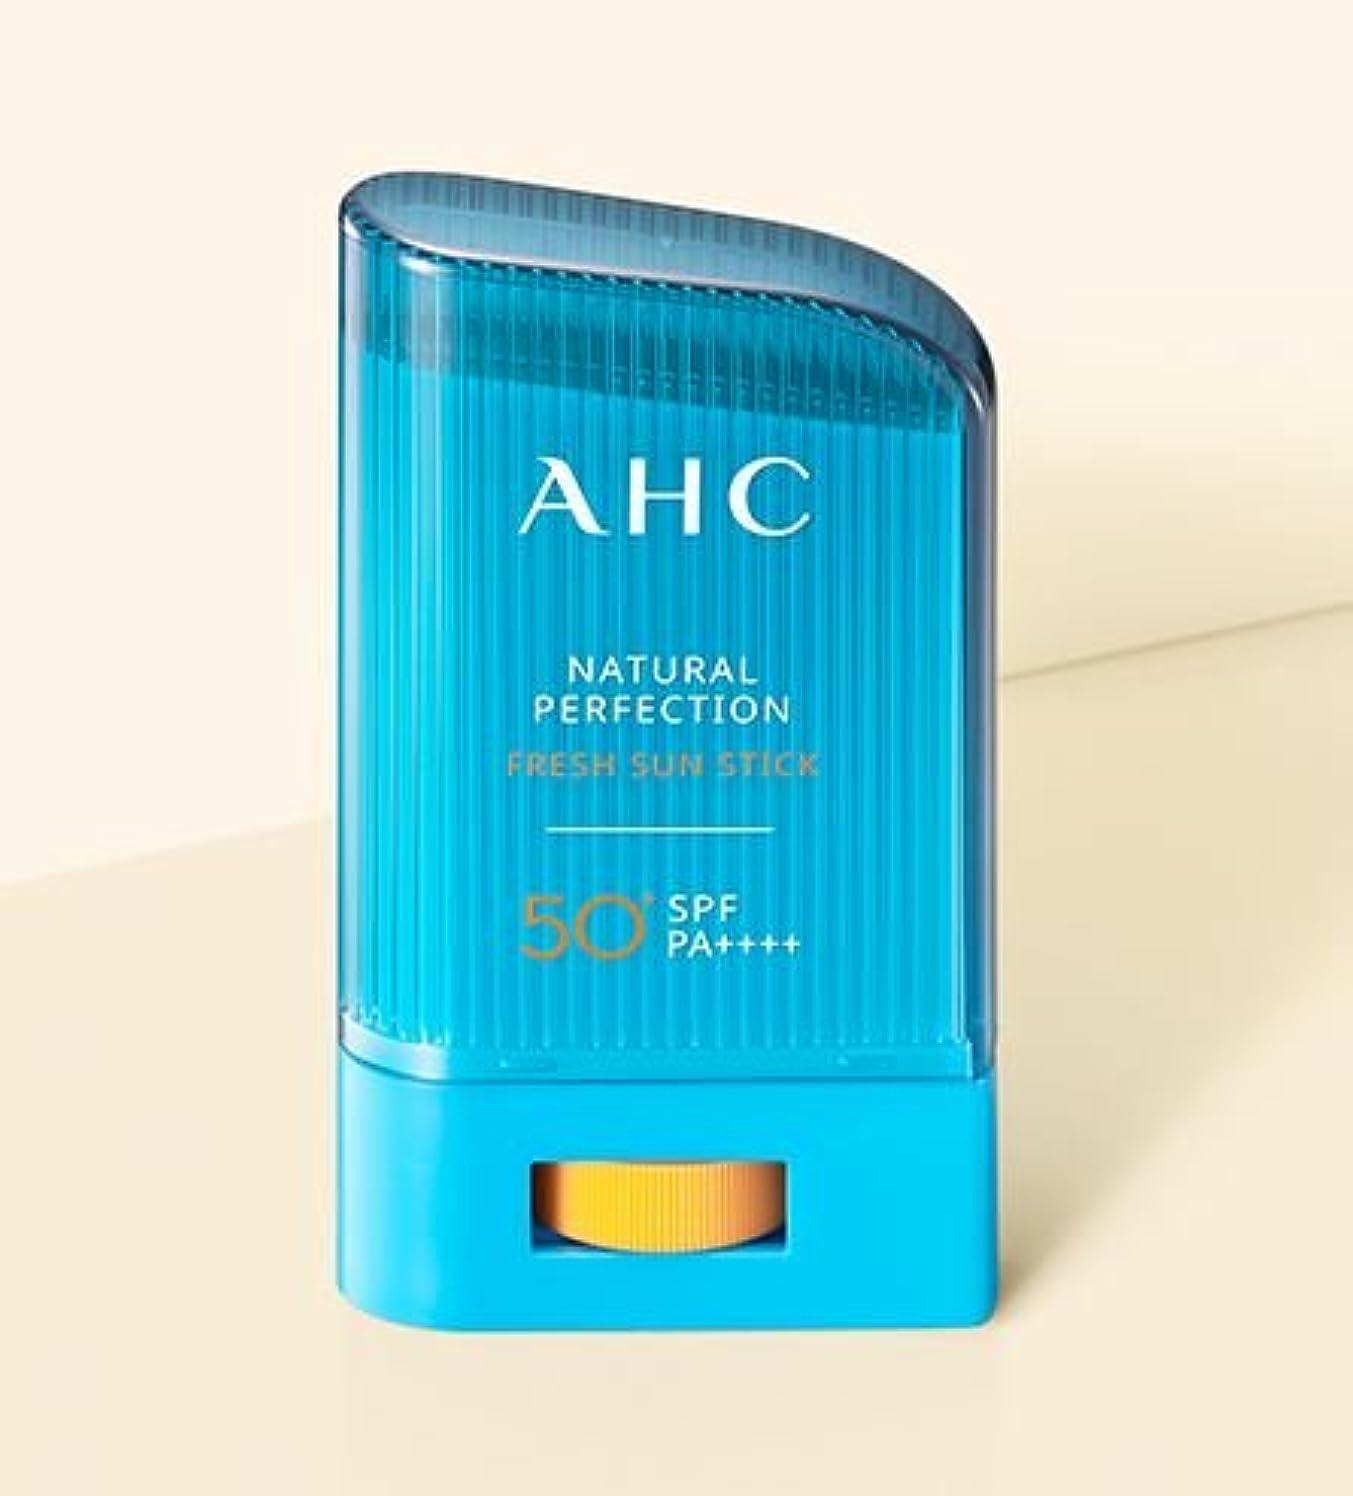 哲学的ヶ月目足枷AHC Natural perfection fresh sun stick (22g) [並行輸入品]